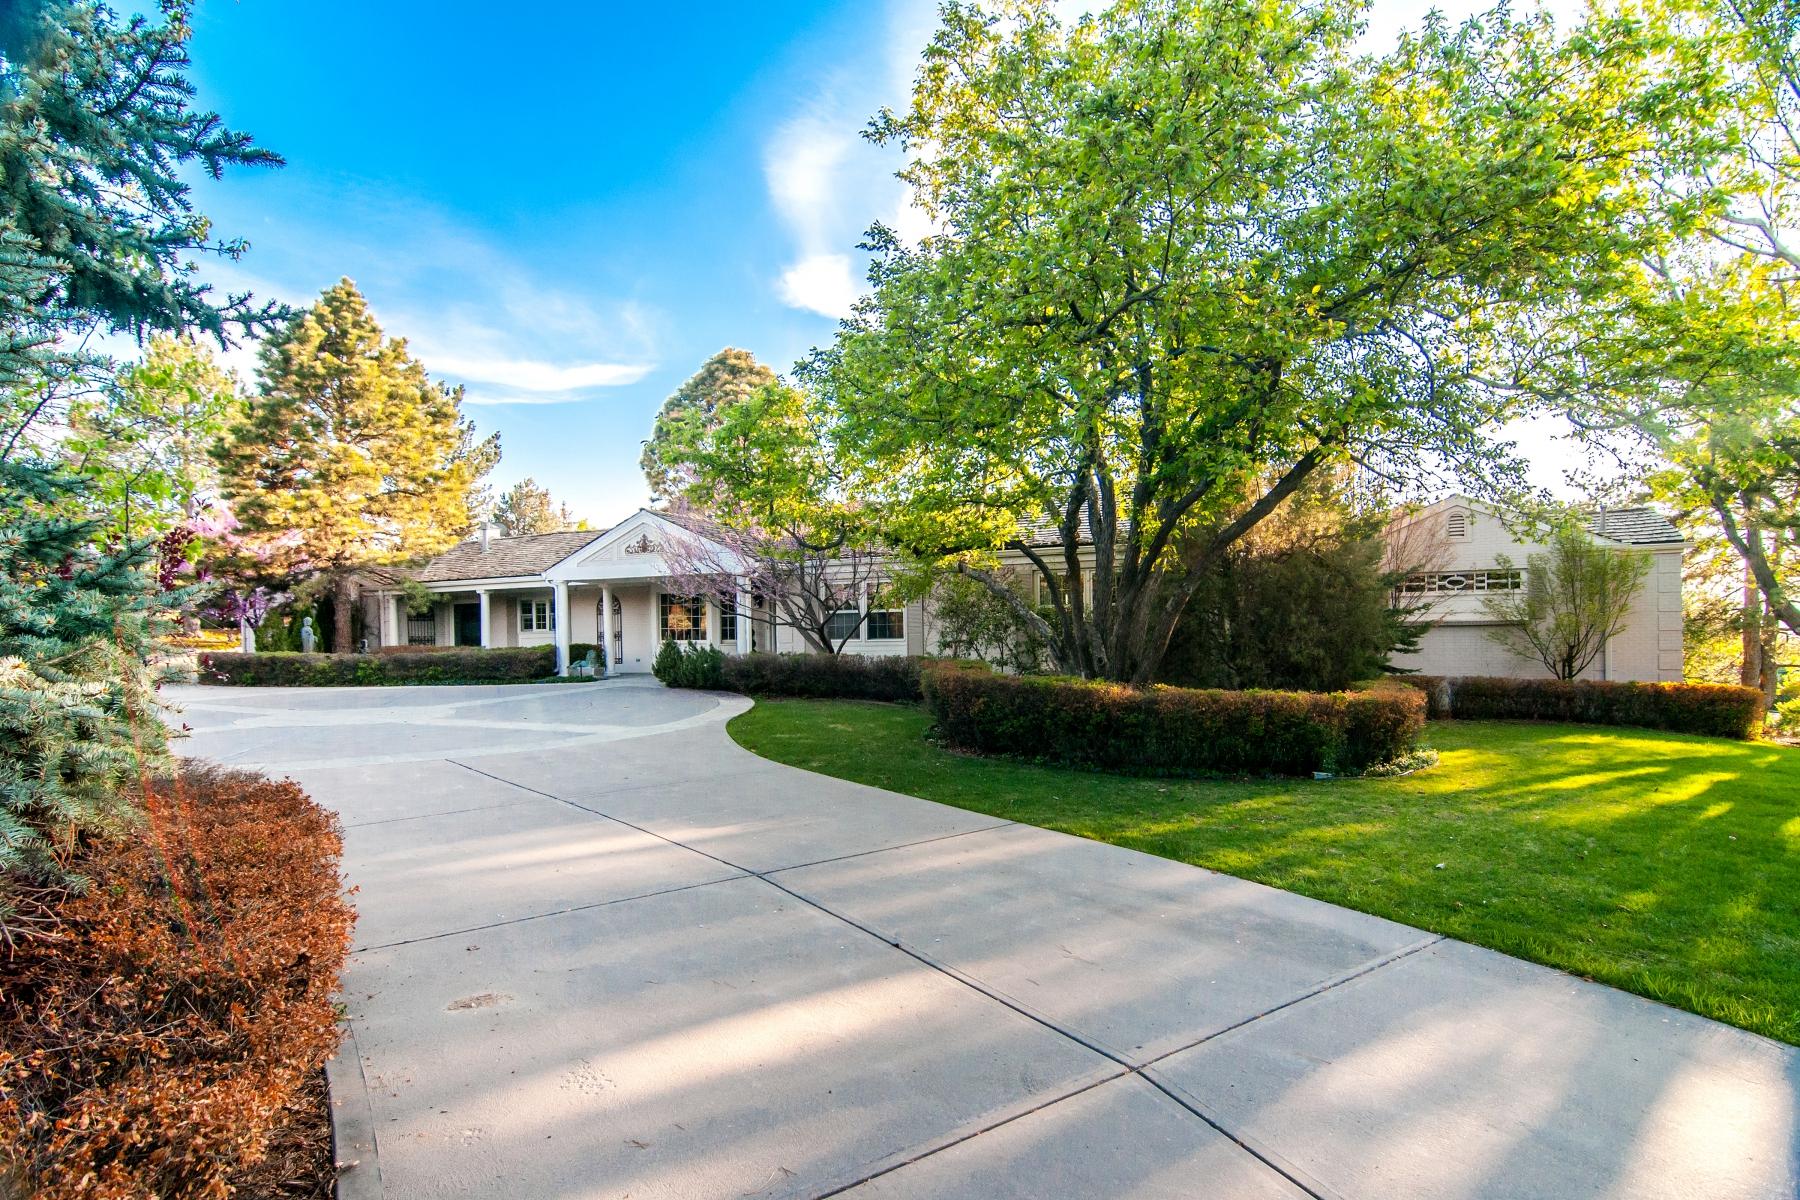 Tek Ailelik Ev için Satış at Spectacular Views from this Santa Barbara-style Ranch 4701 South Dasa Drive Cherry Hills Village, Colorado 80111 Amerika Birleşik Devletleri